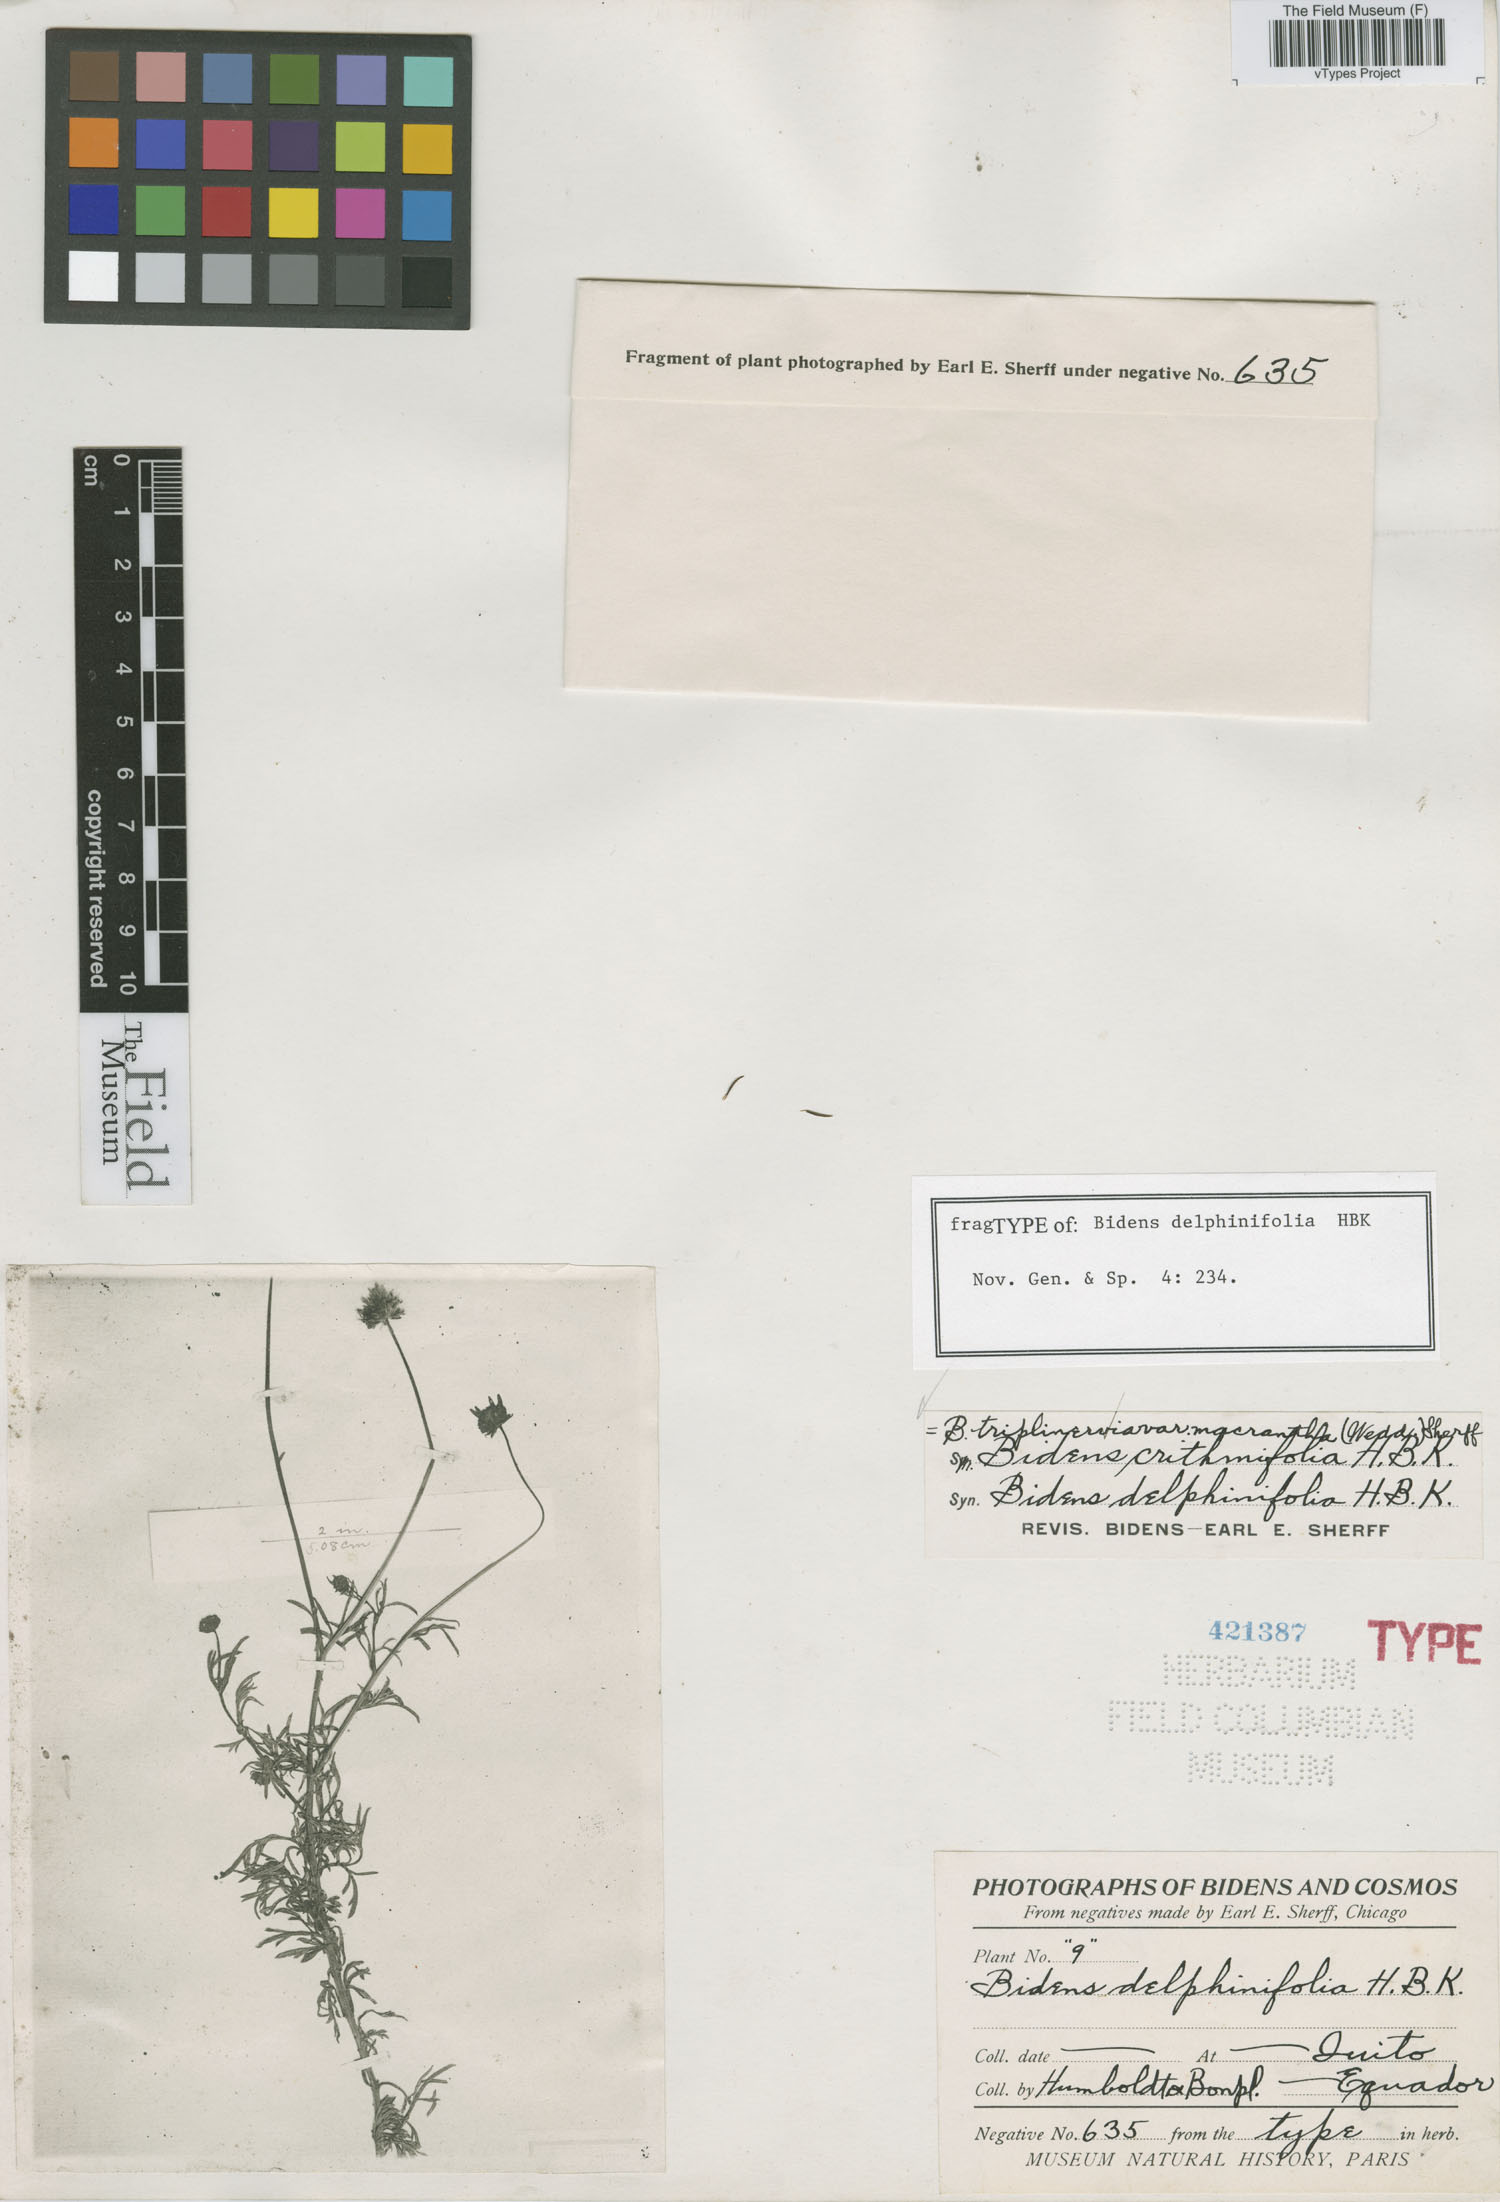 Bidens delphinifolia image